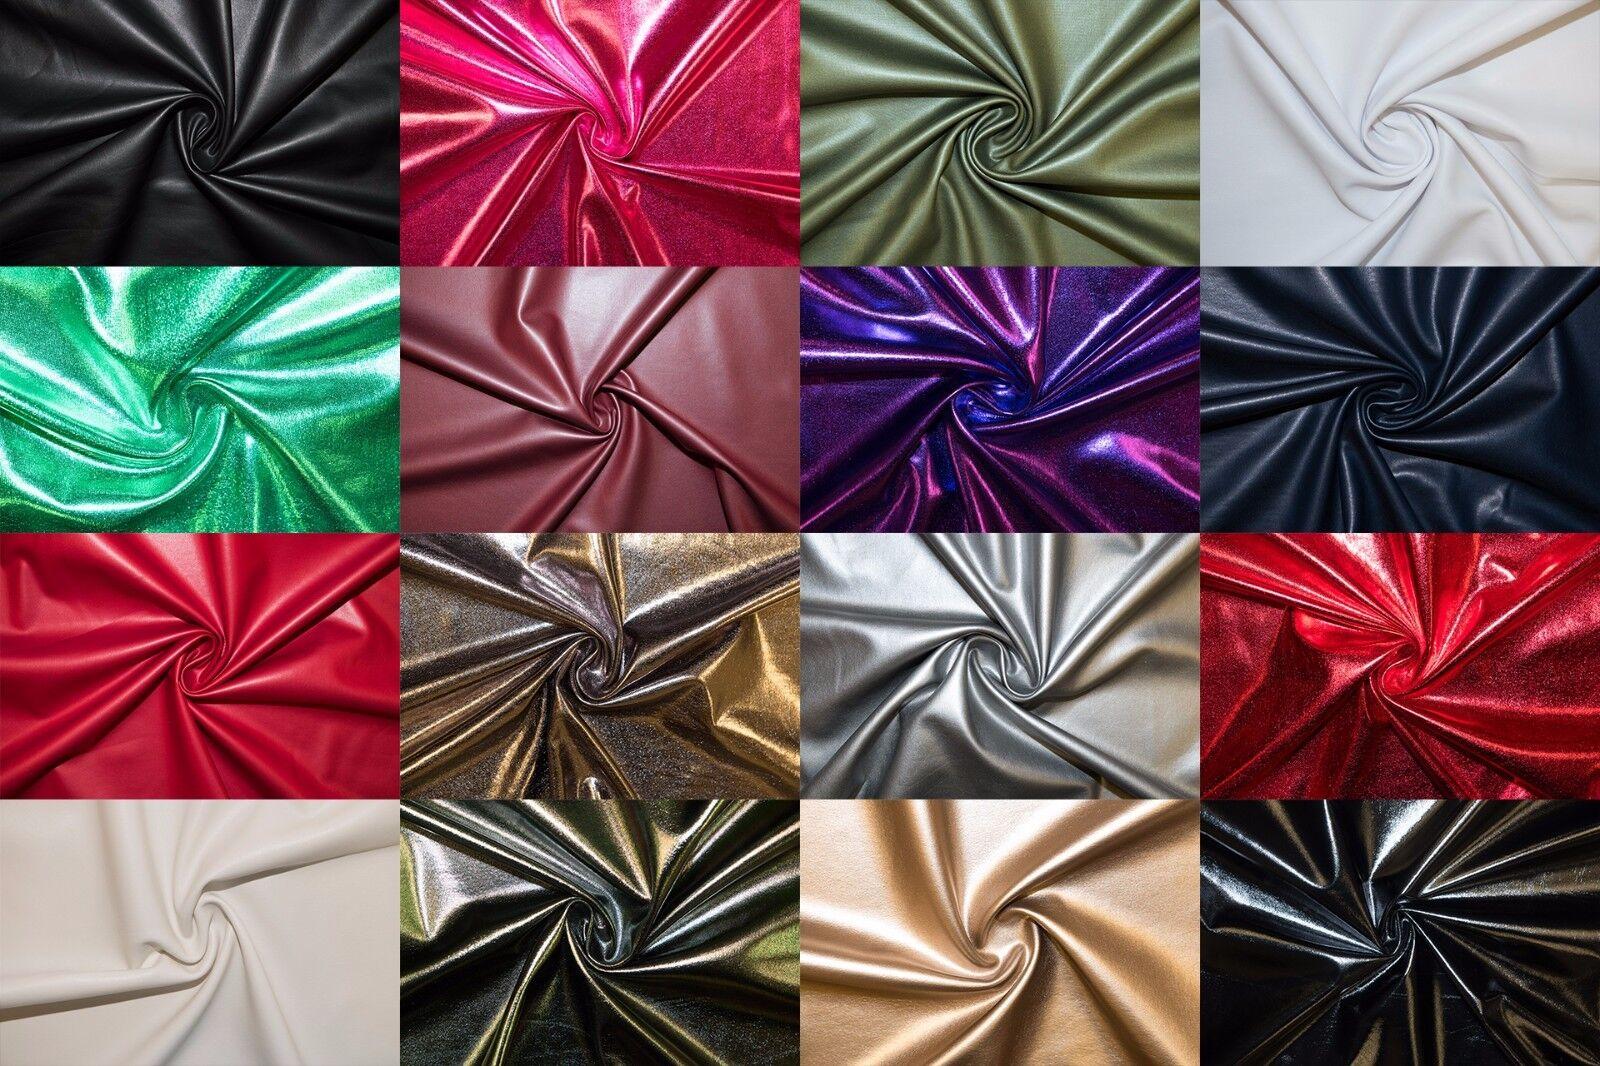 Pleather Faux Leather Vinyl Stretch Polyester Lycra Spandex